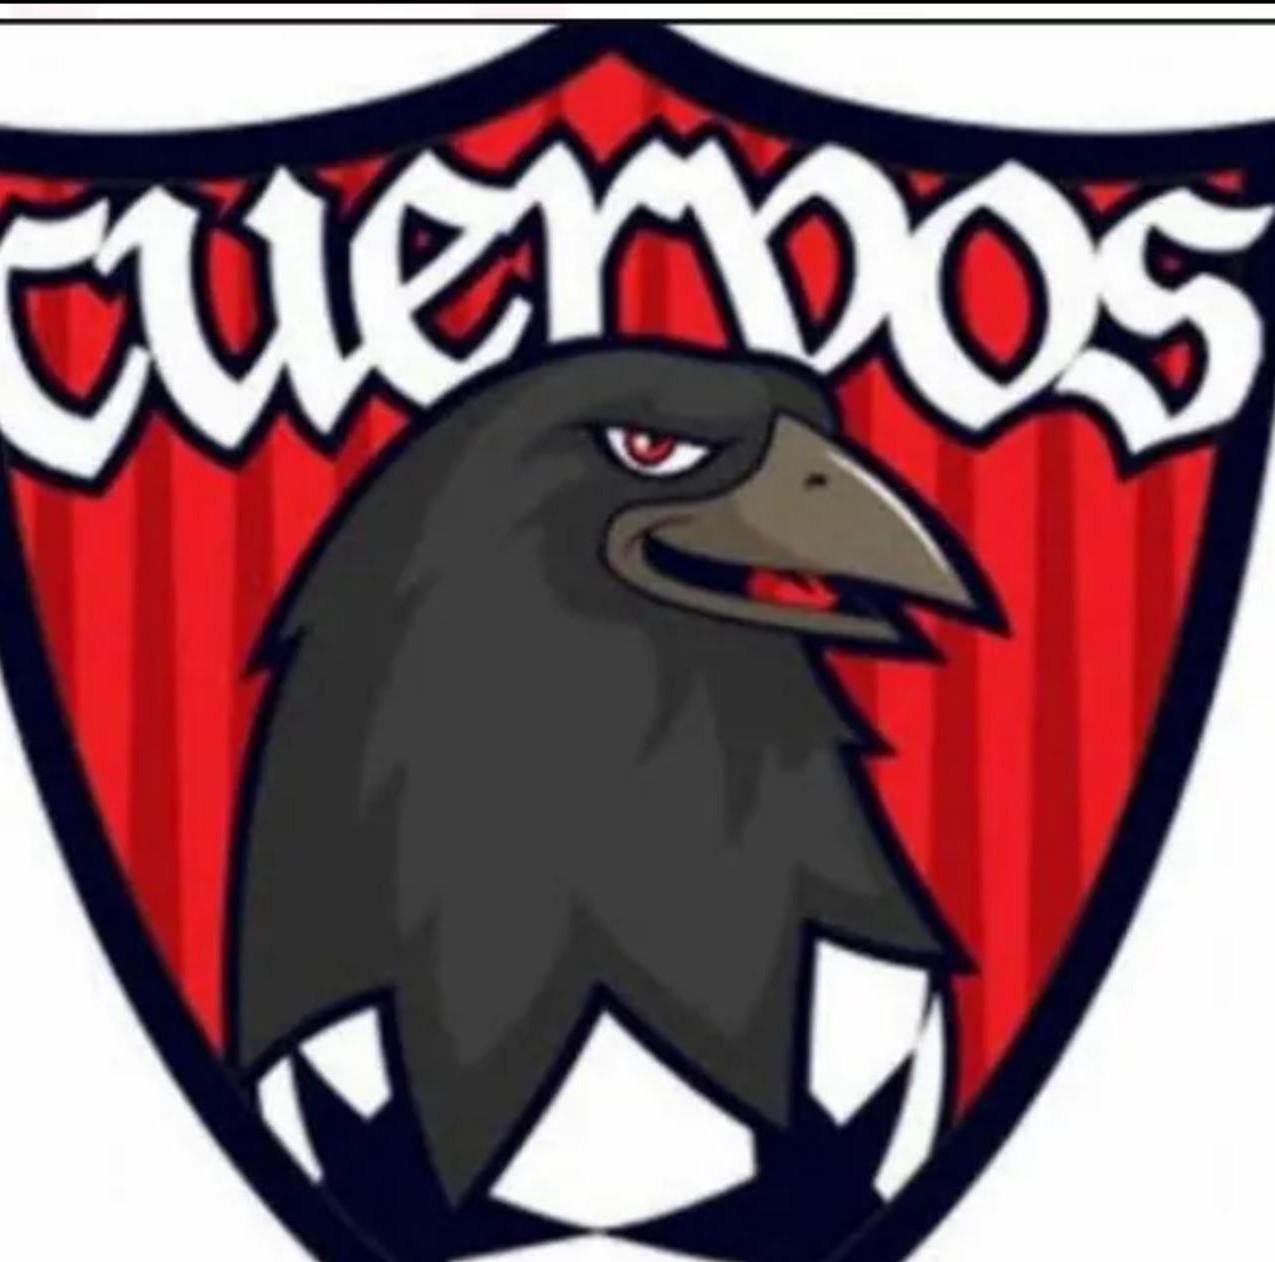 escudo Cuervos 2006